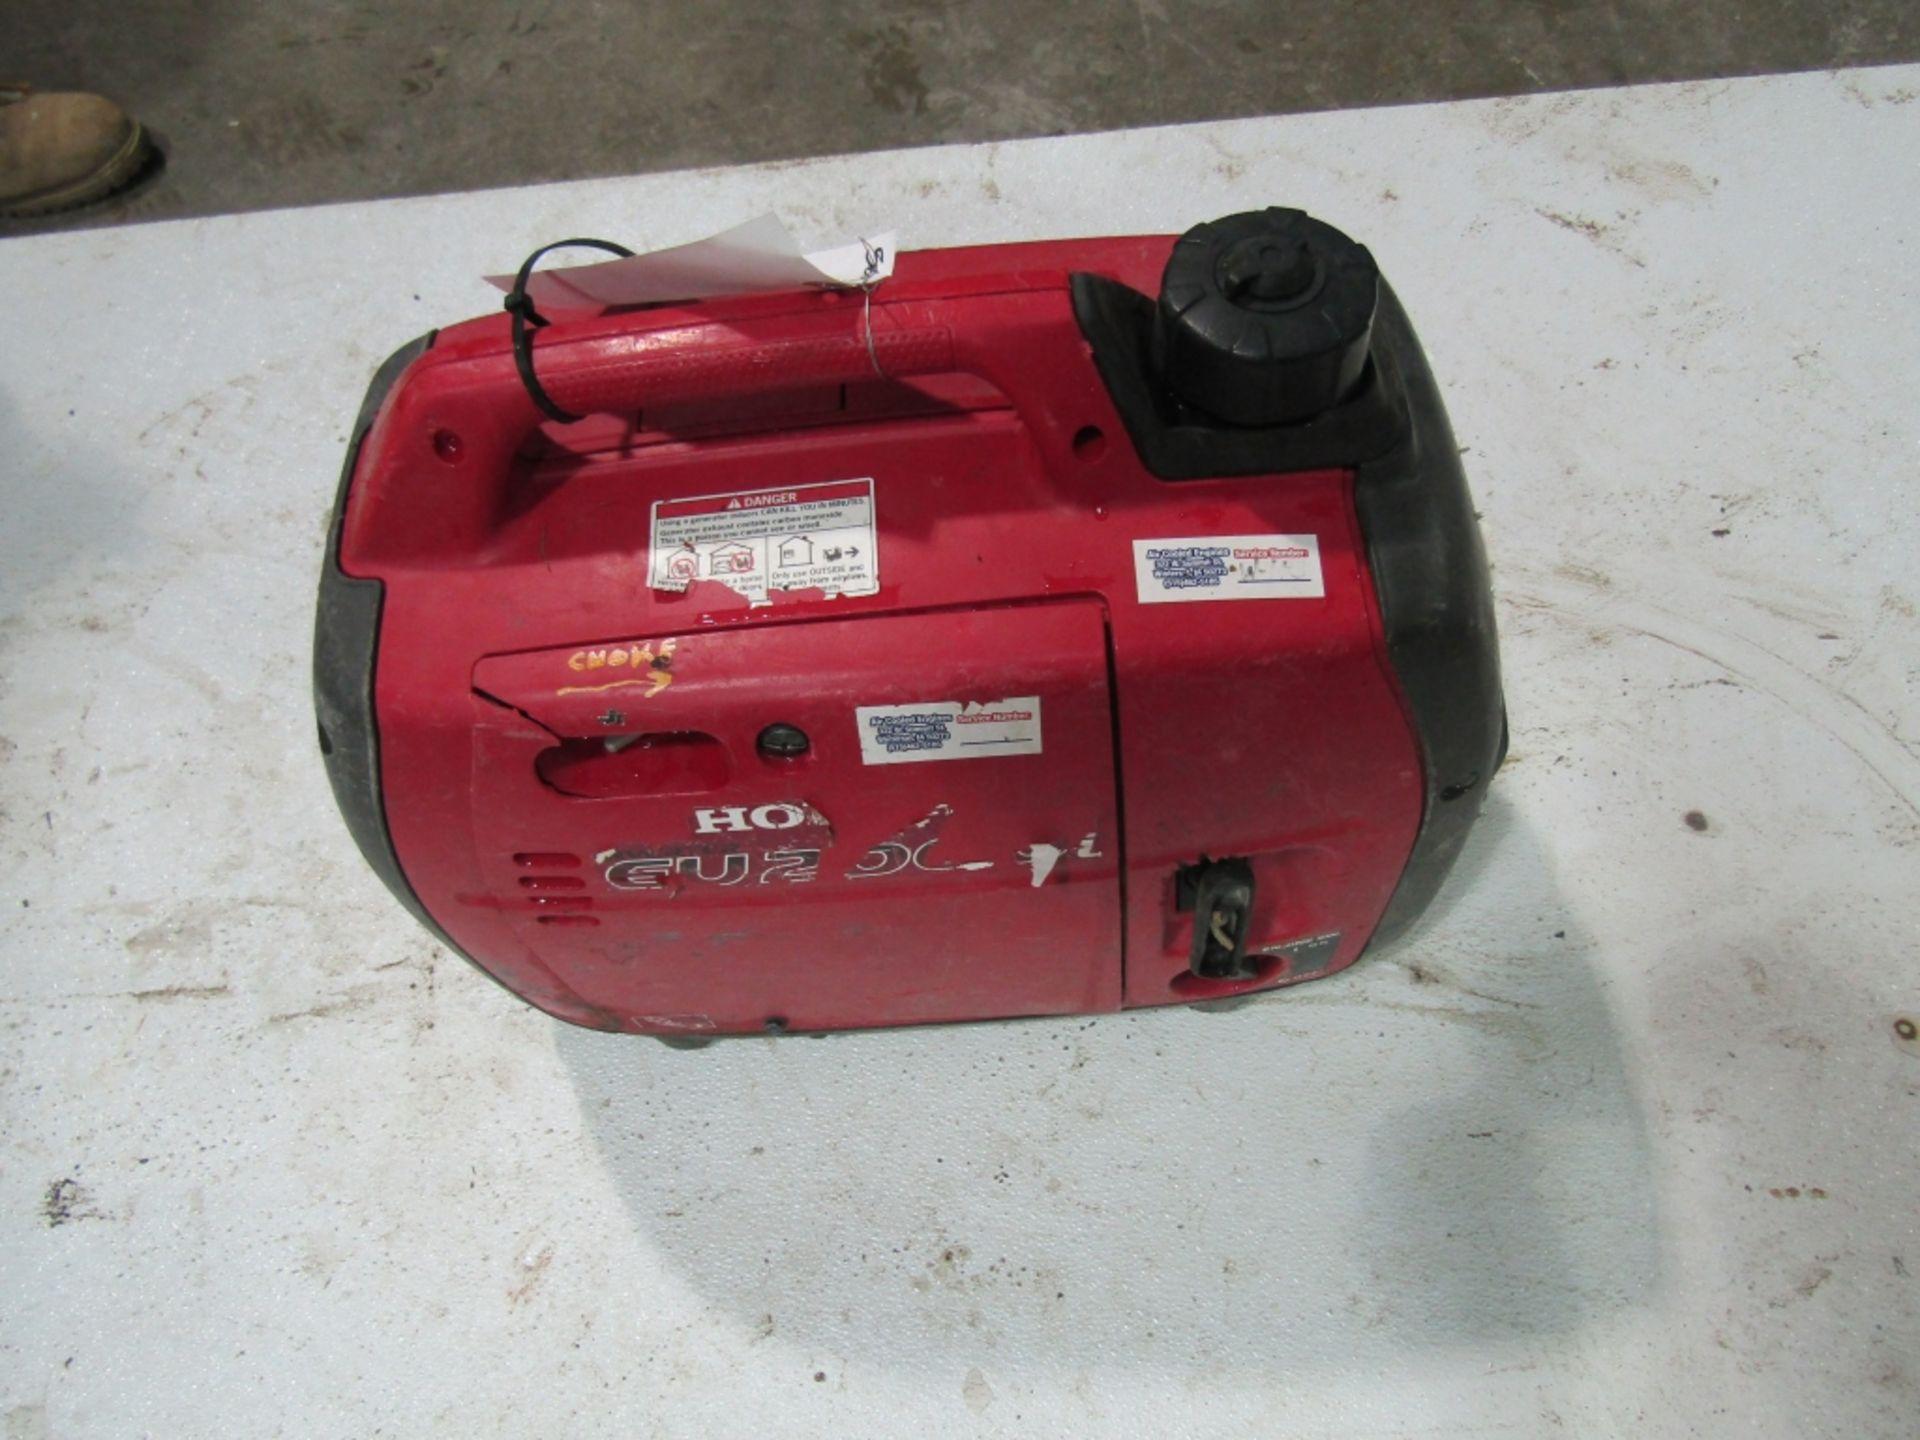 Lot 289 - Honda GU2000 Generator, 120 Volt, Located in Winterset, IA